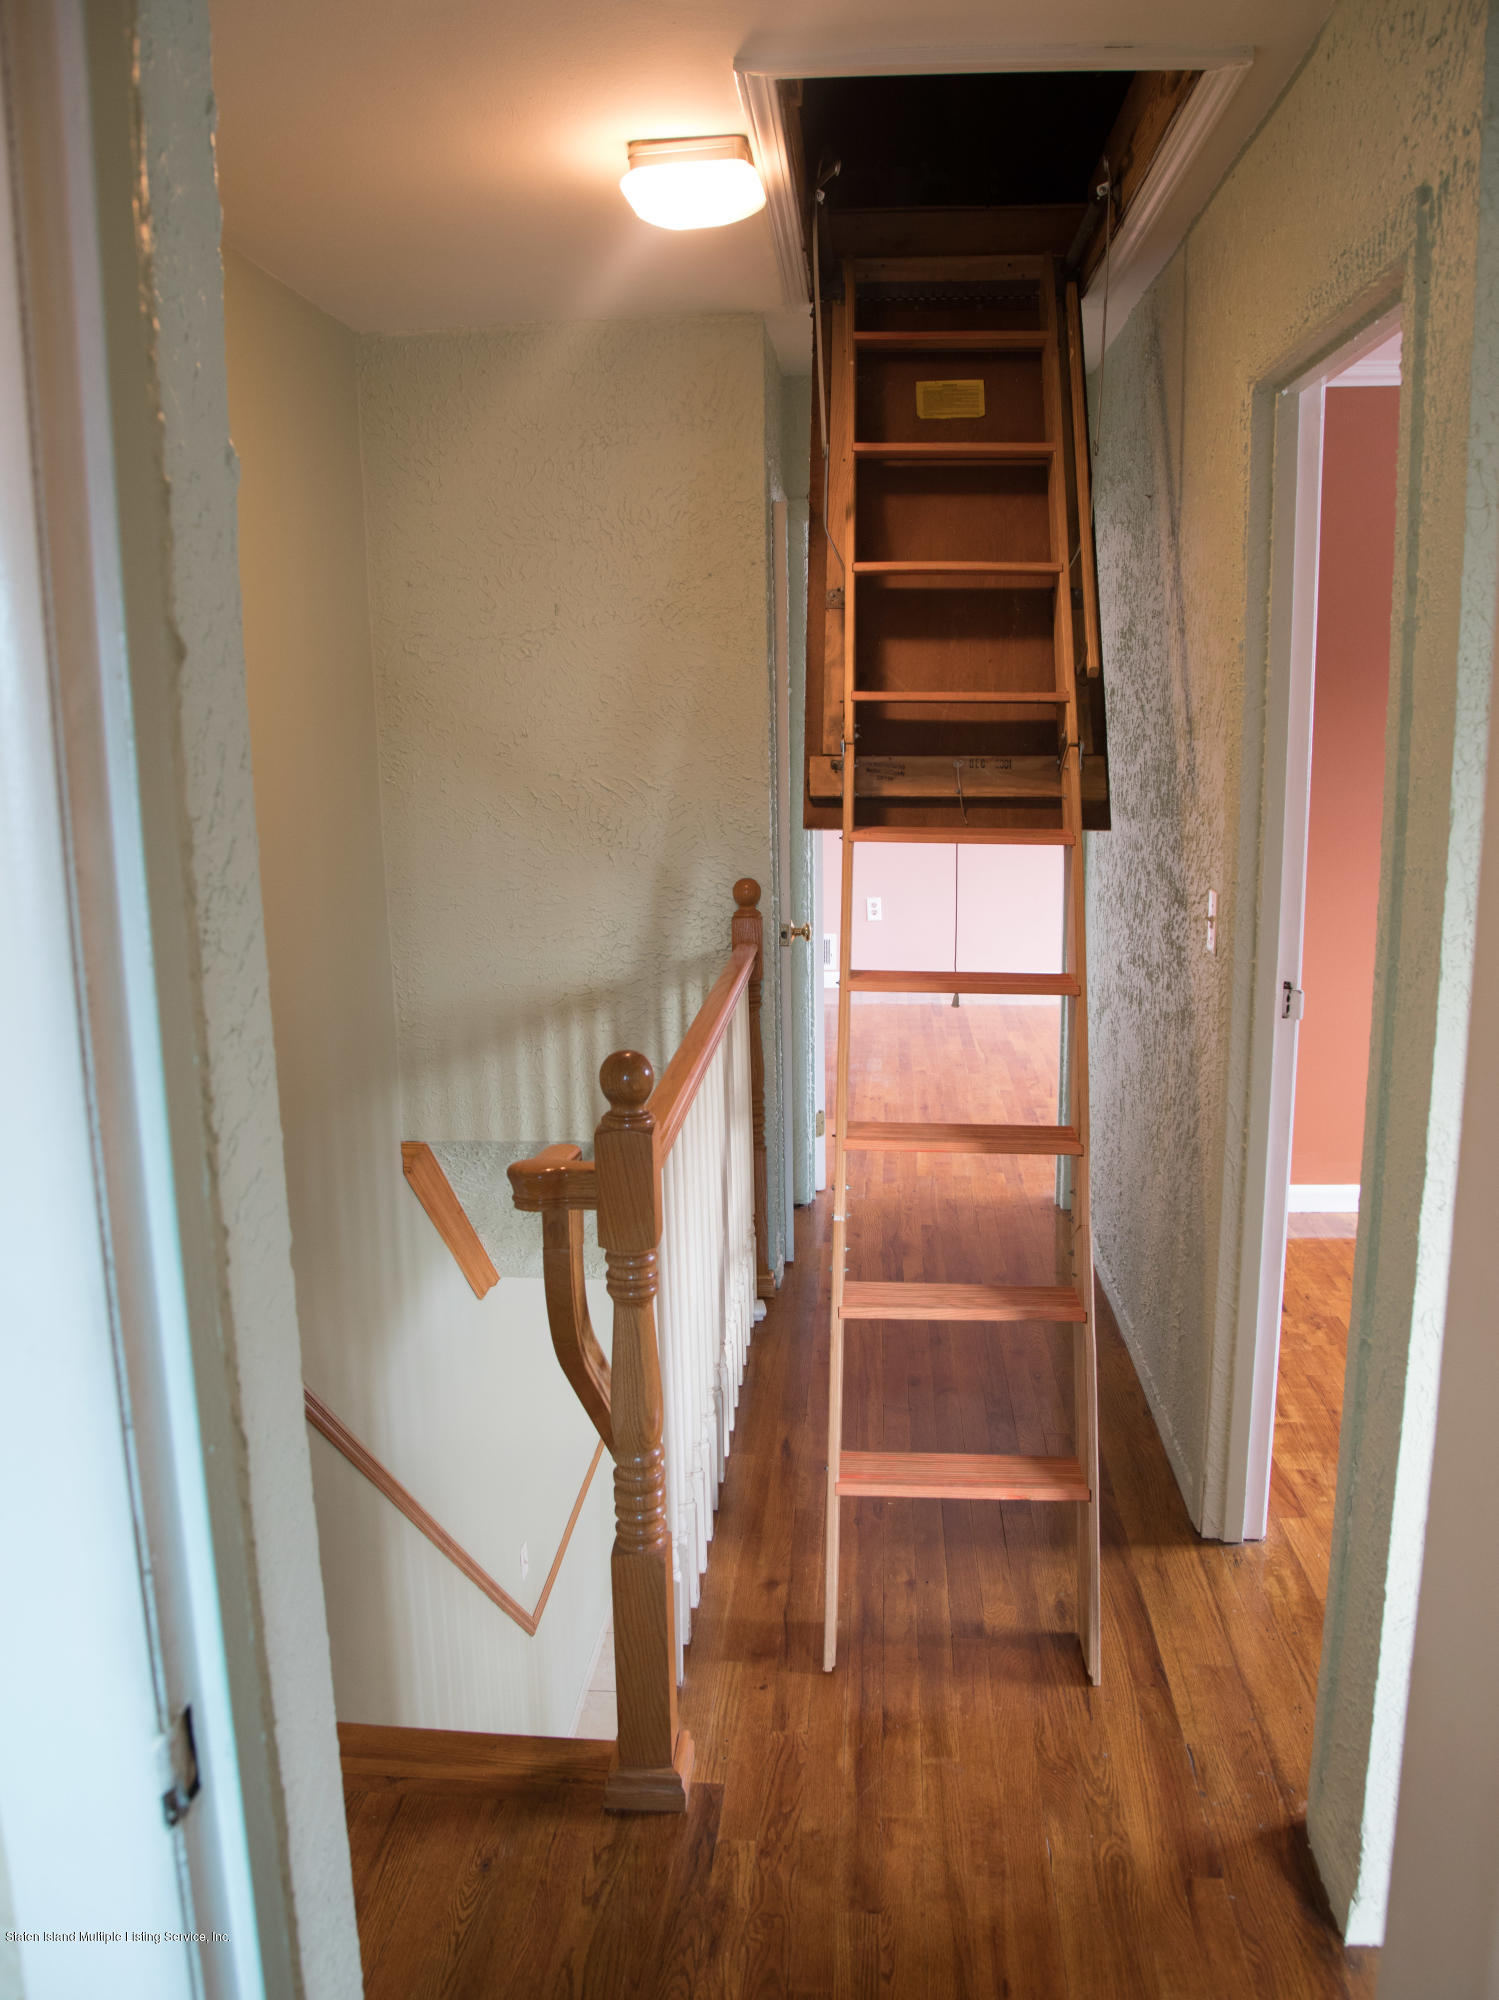 75 Amber Street Staten Island,New York,10306,United States,3 Bedrooms Bedrooms,6 Rooms Rooms,3 BathroomsBathrooms,Residential,Amber Street,1134270